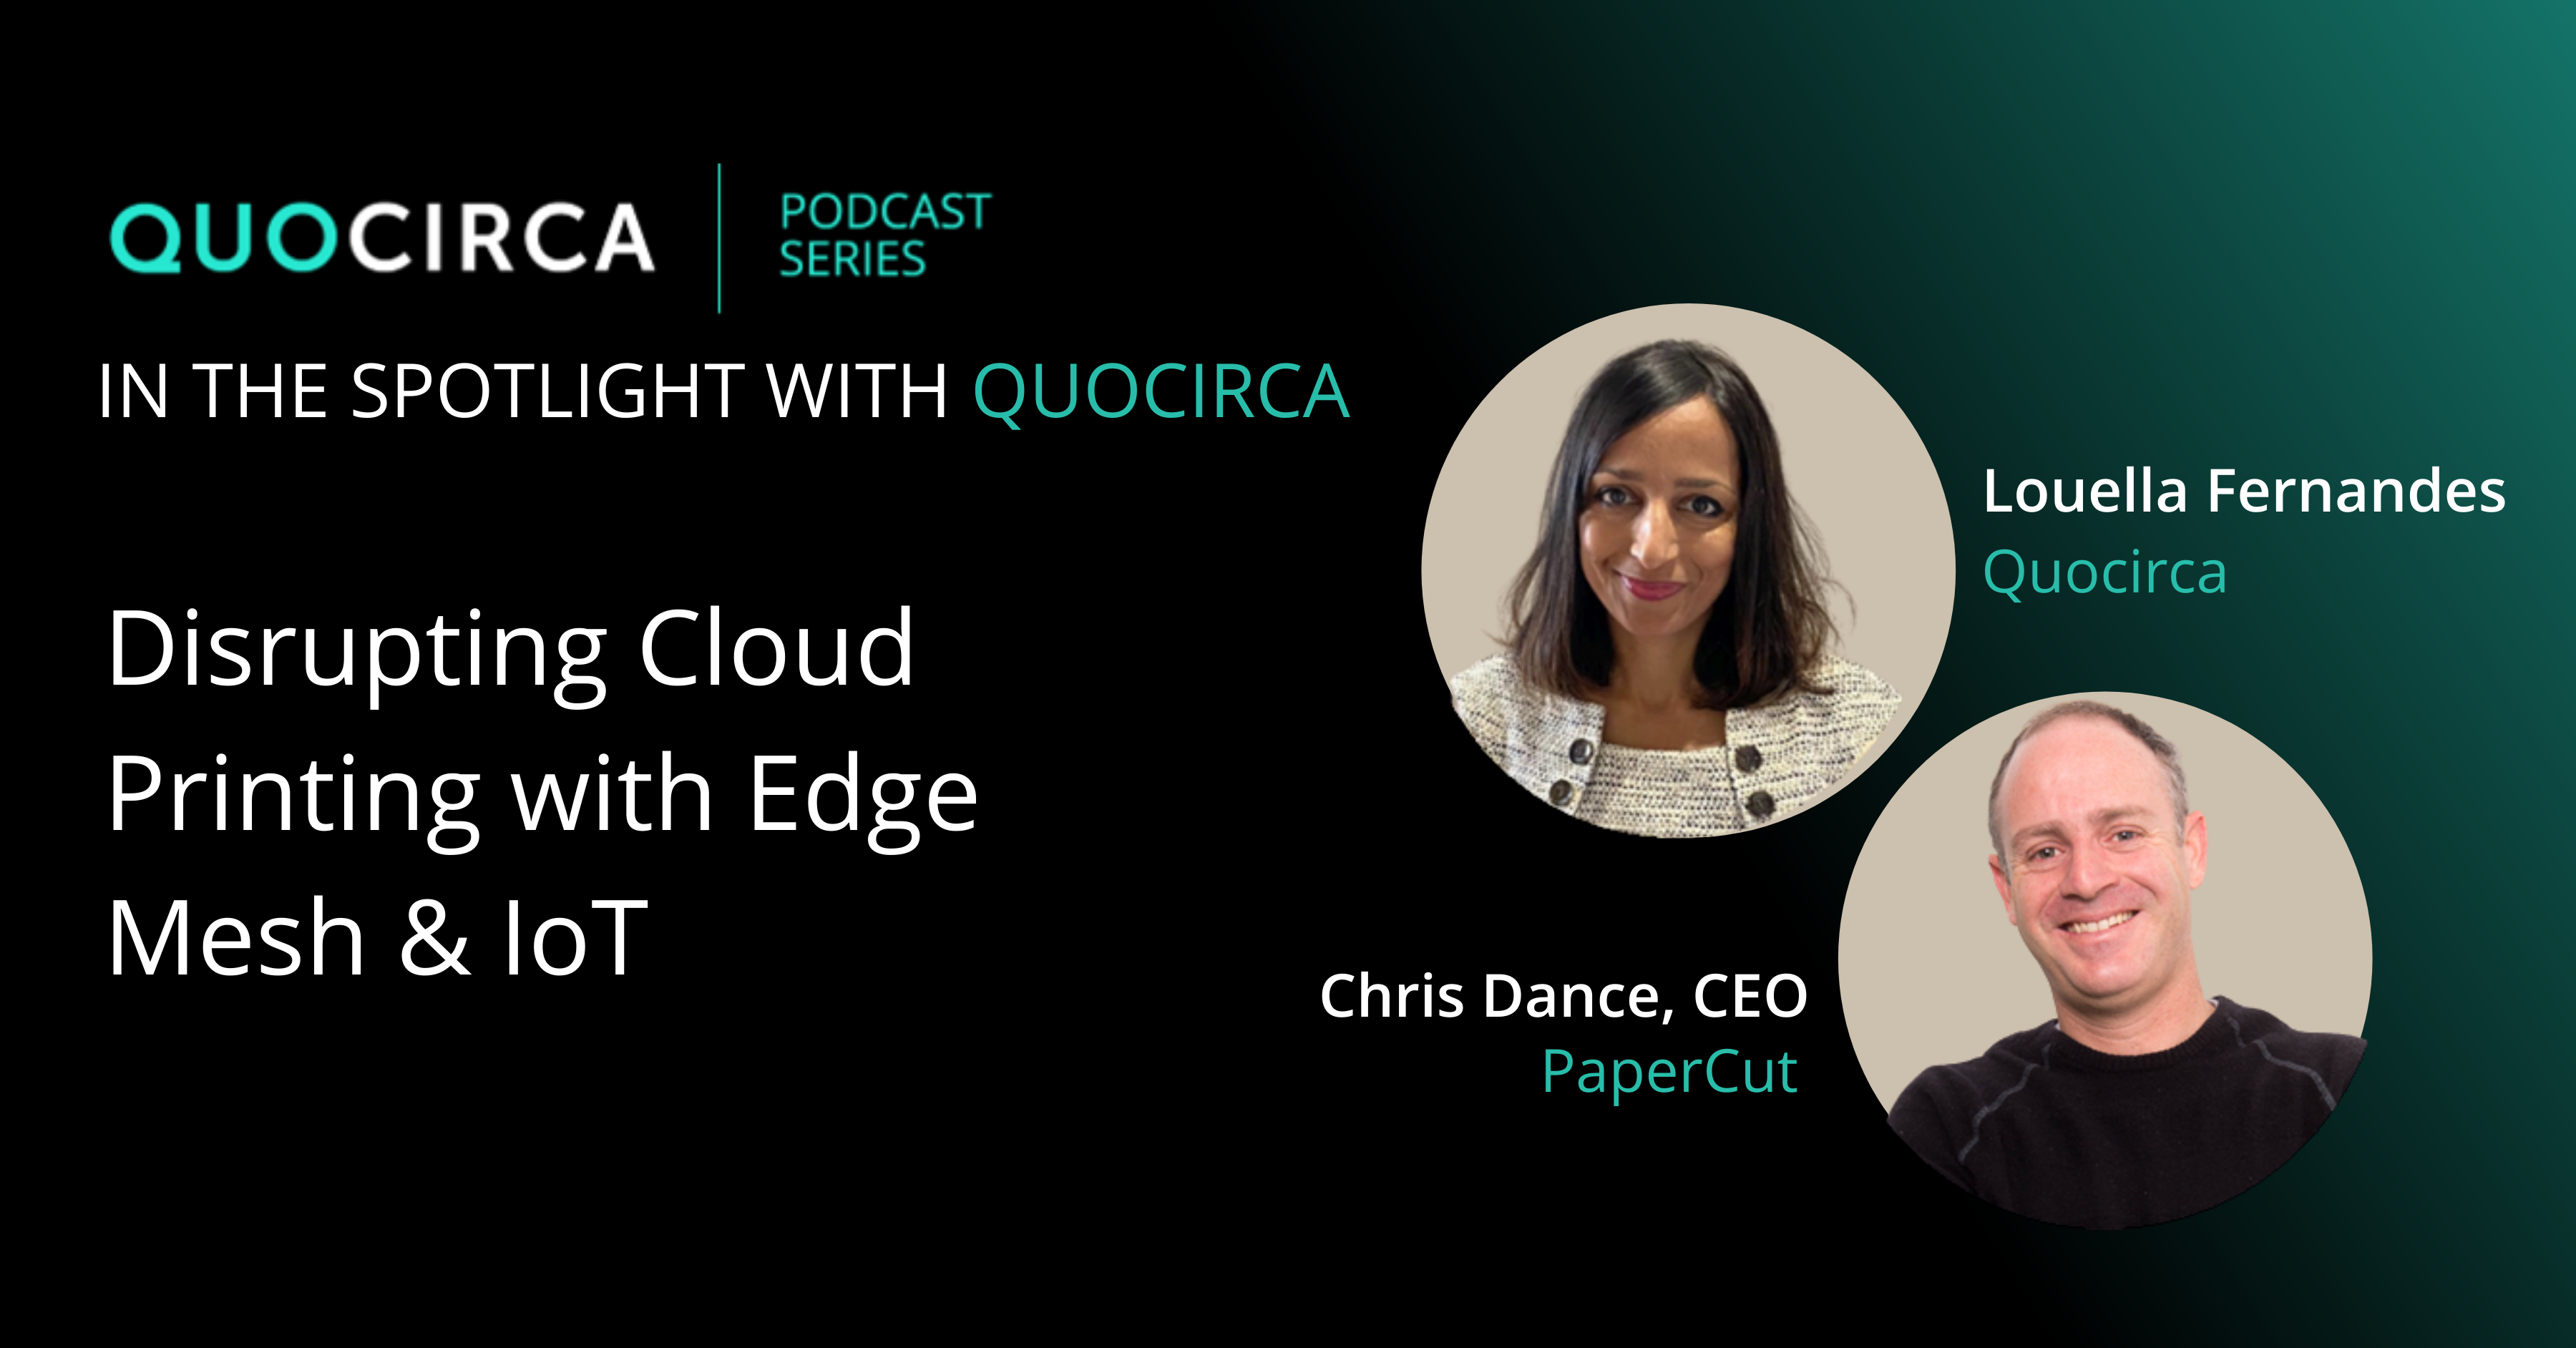 Disrupting Cloud Printing with Edge Mesh & IoT, with Chris Dance, PaperCut